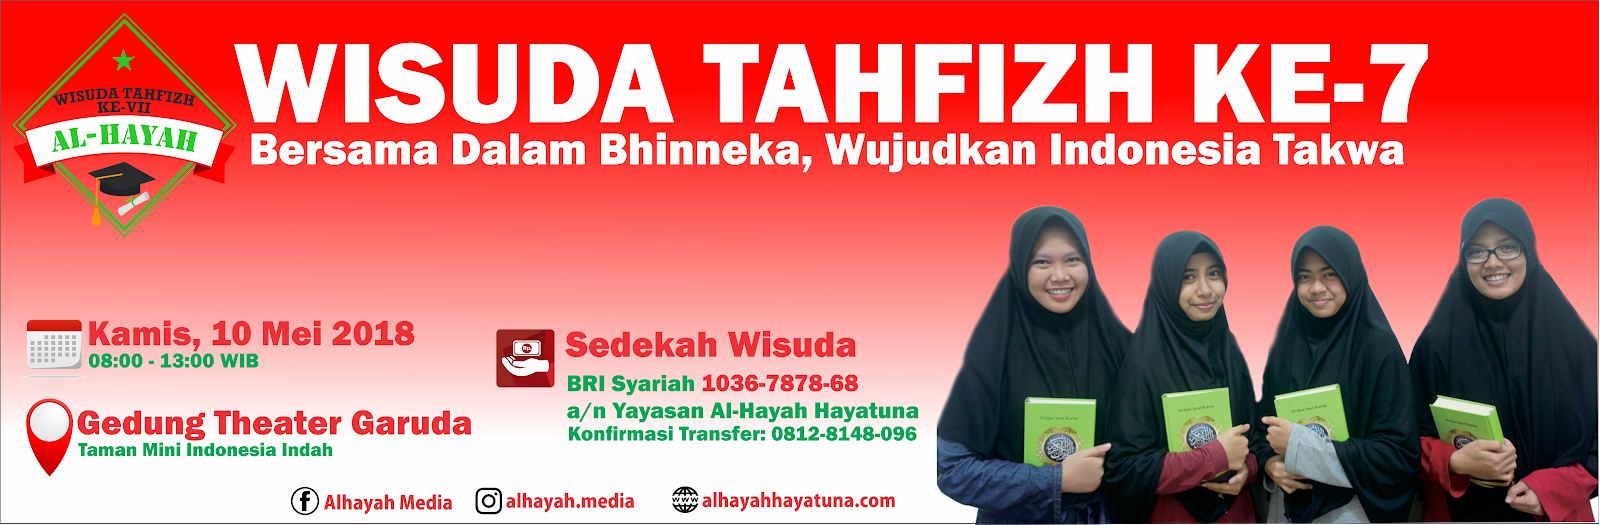 SELAMAT DATANG DI WEBSITE AL-HAYAH